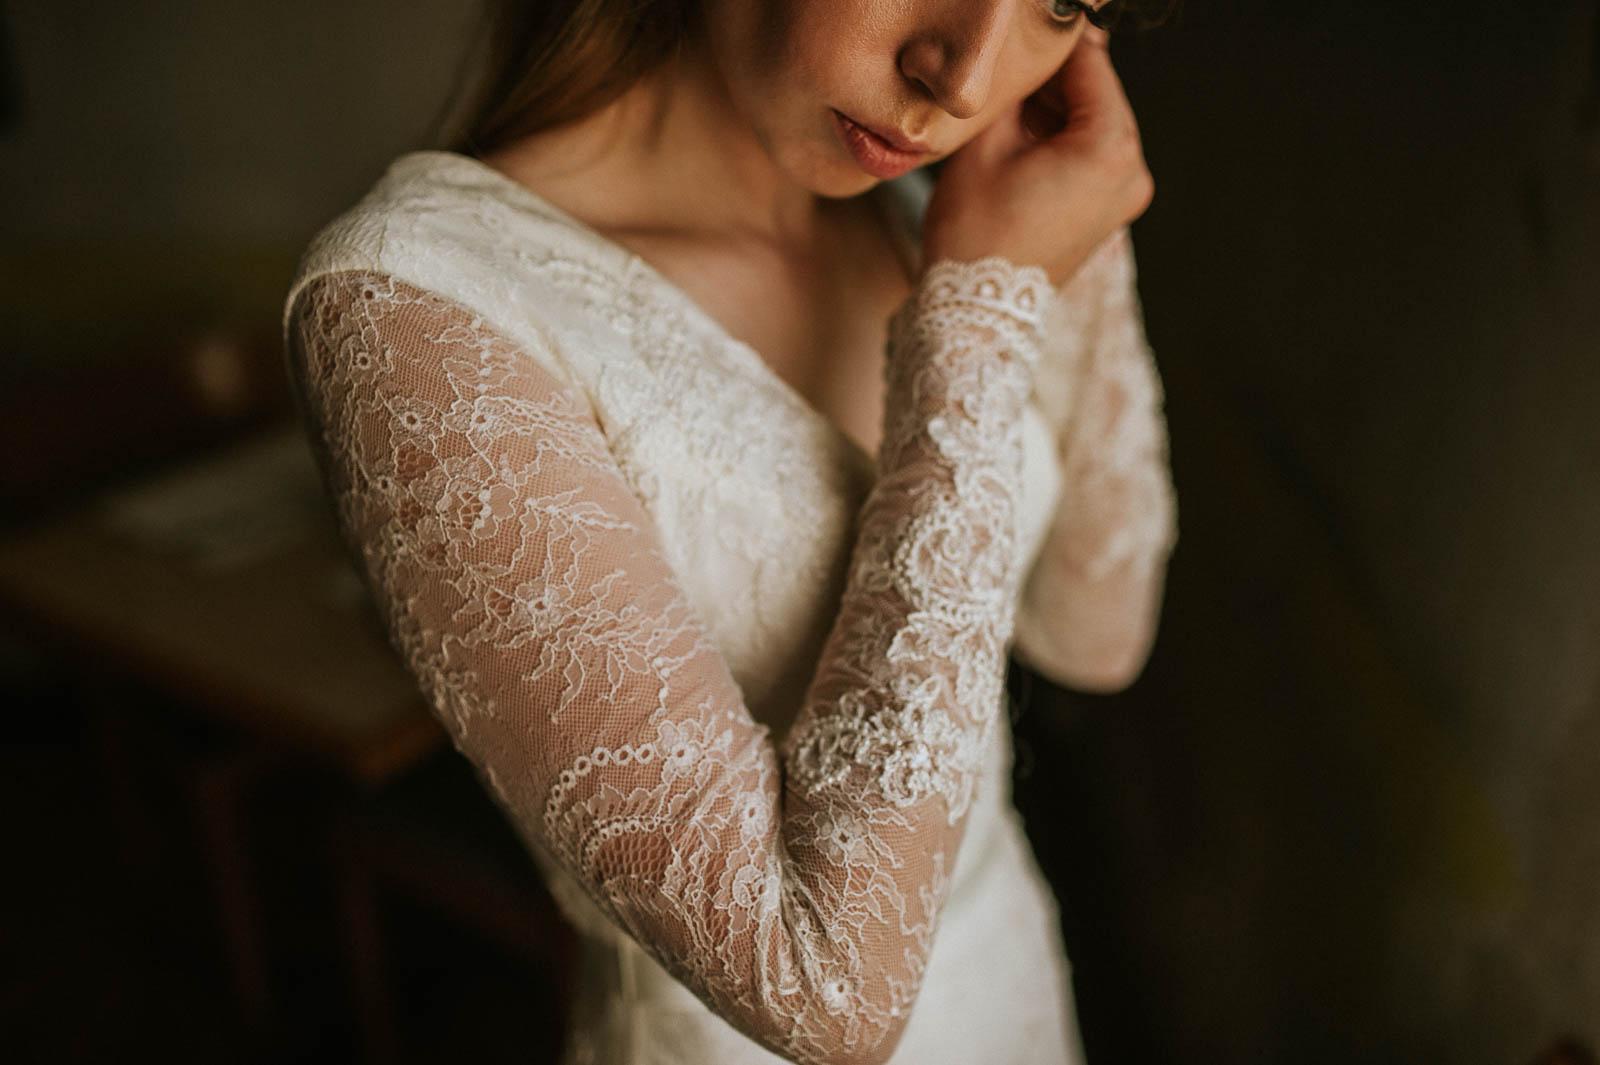 Pohjaka_mois_manor_pulm_wedding_Mait_Juriado-06